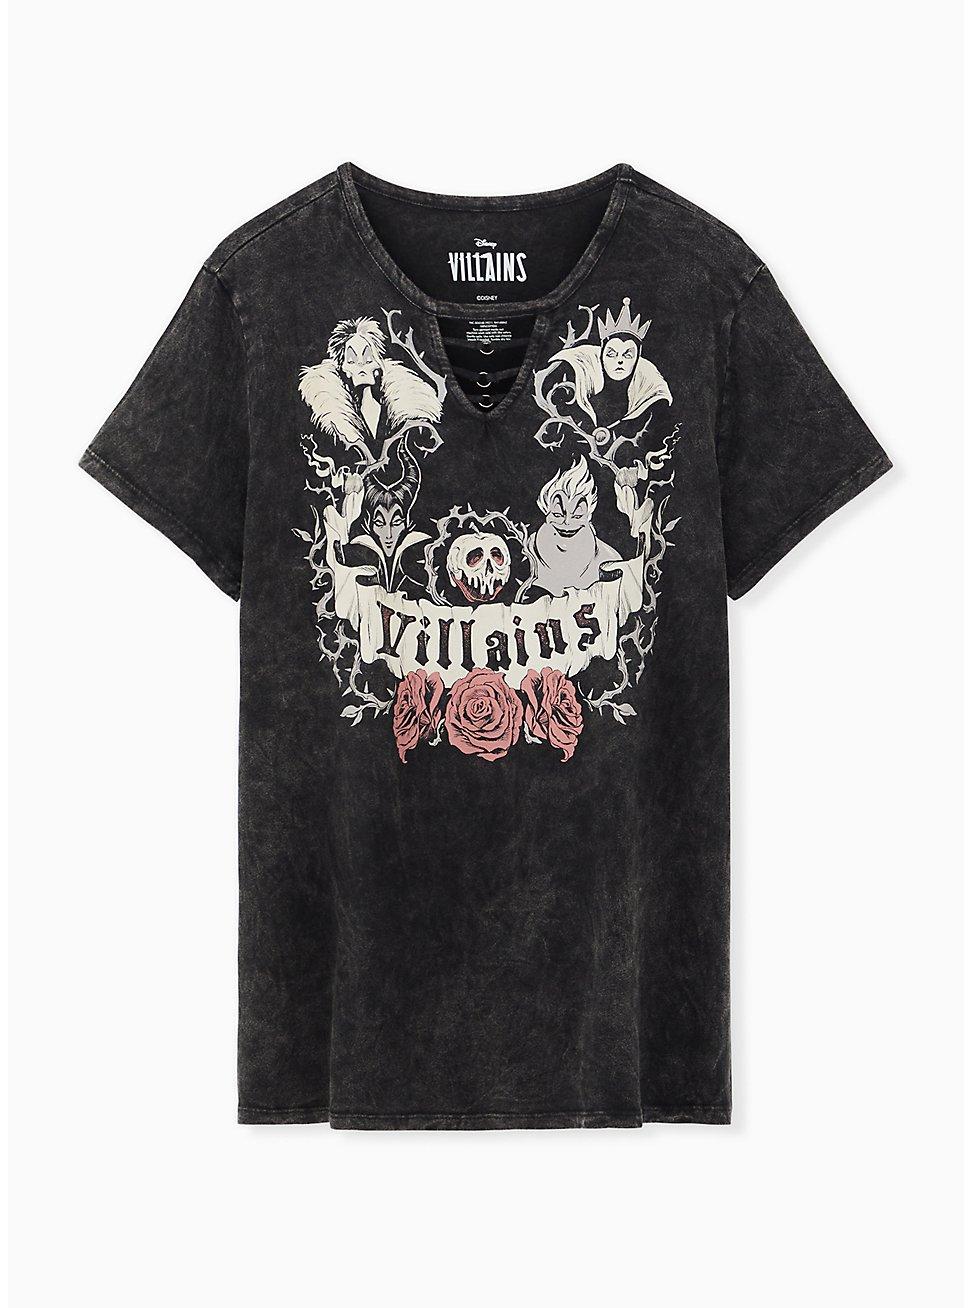 Disney Villains Black Mineral Wash O-ring Top, DEEP BLACK, hi-res